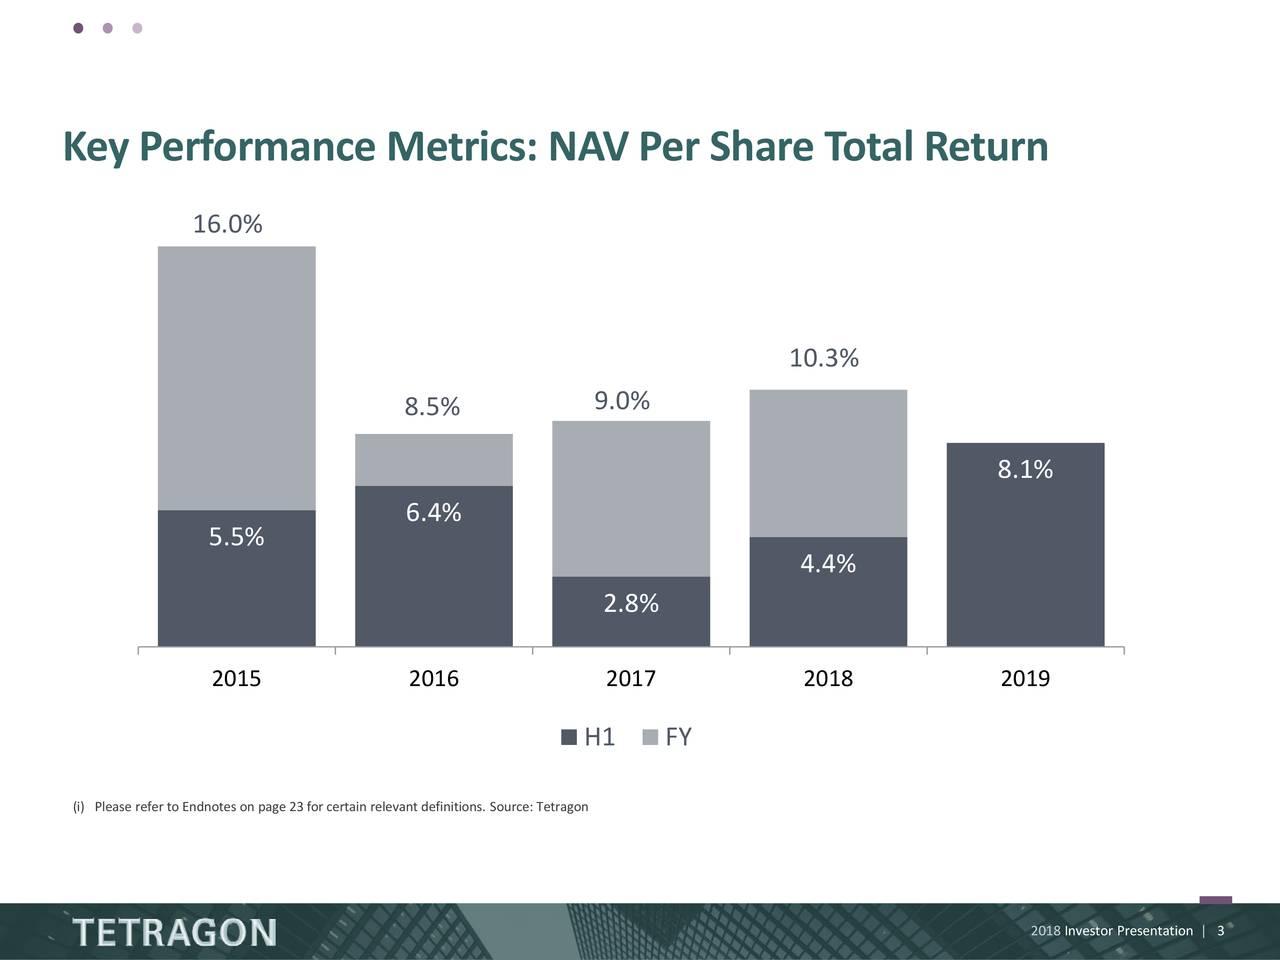 Key Performance Metrics: NAV Per Share Total Return